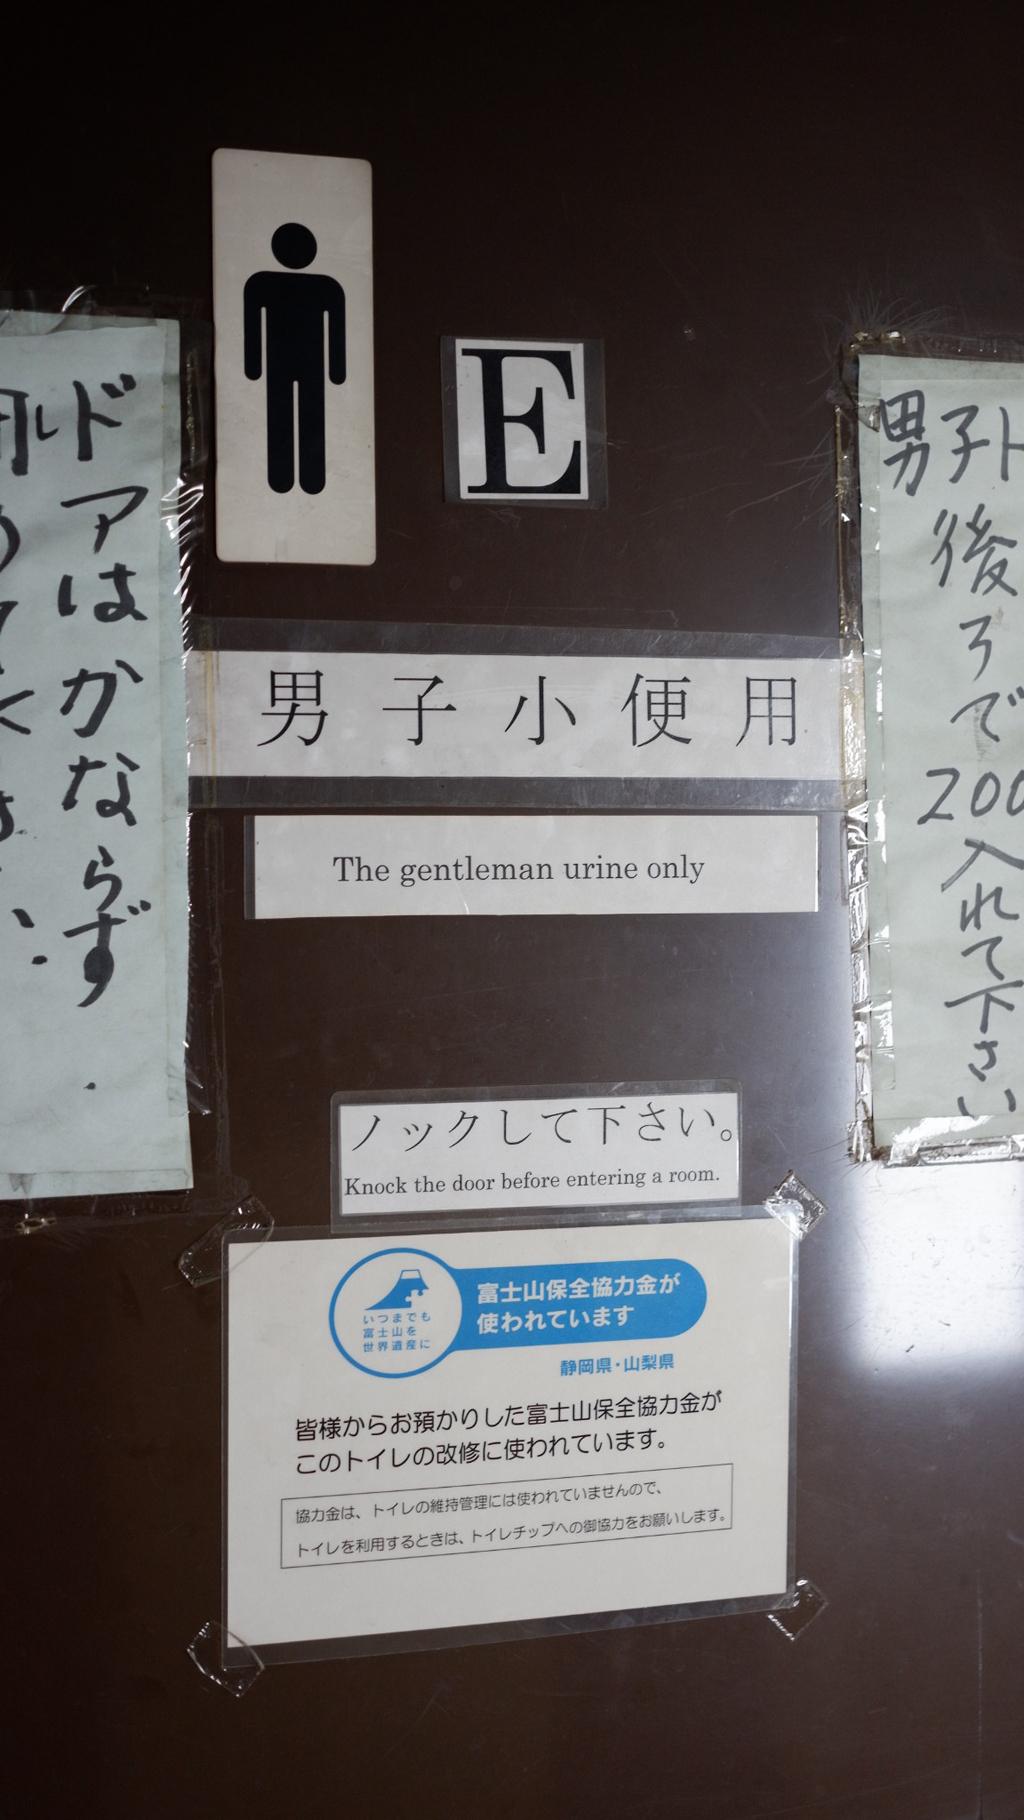 Toilet Cowok di Gunung Fuji